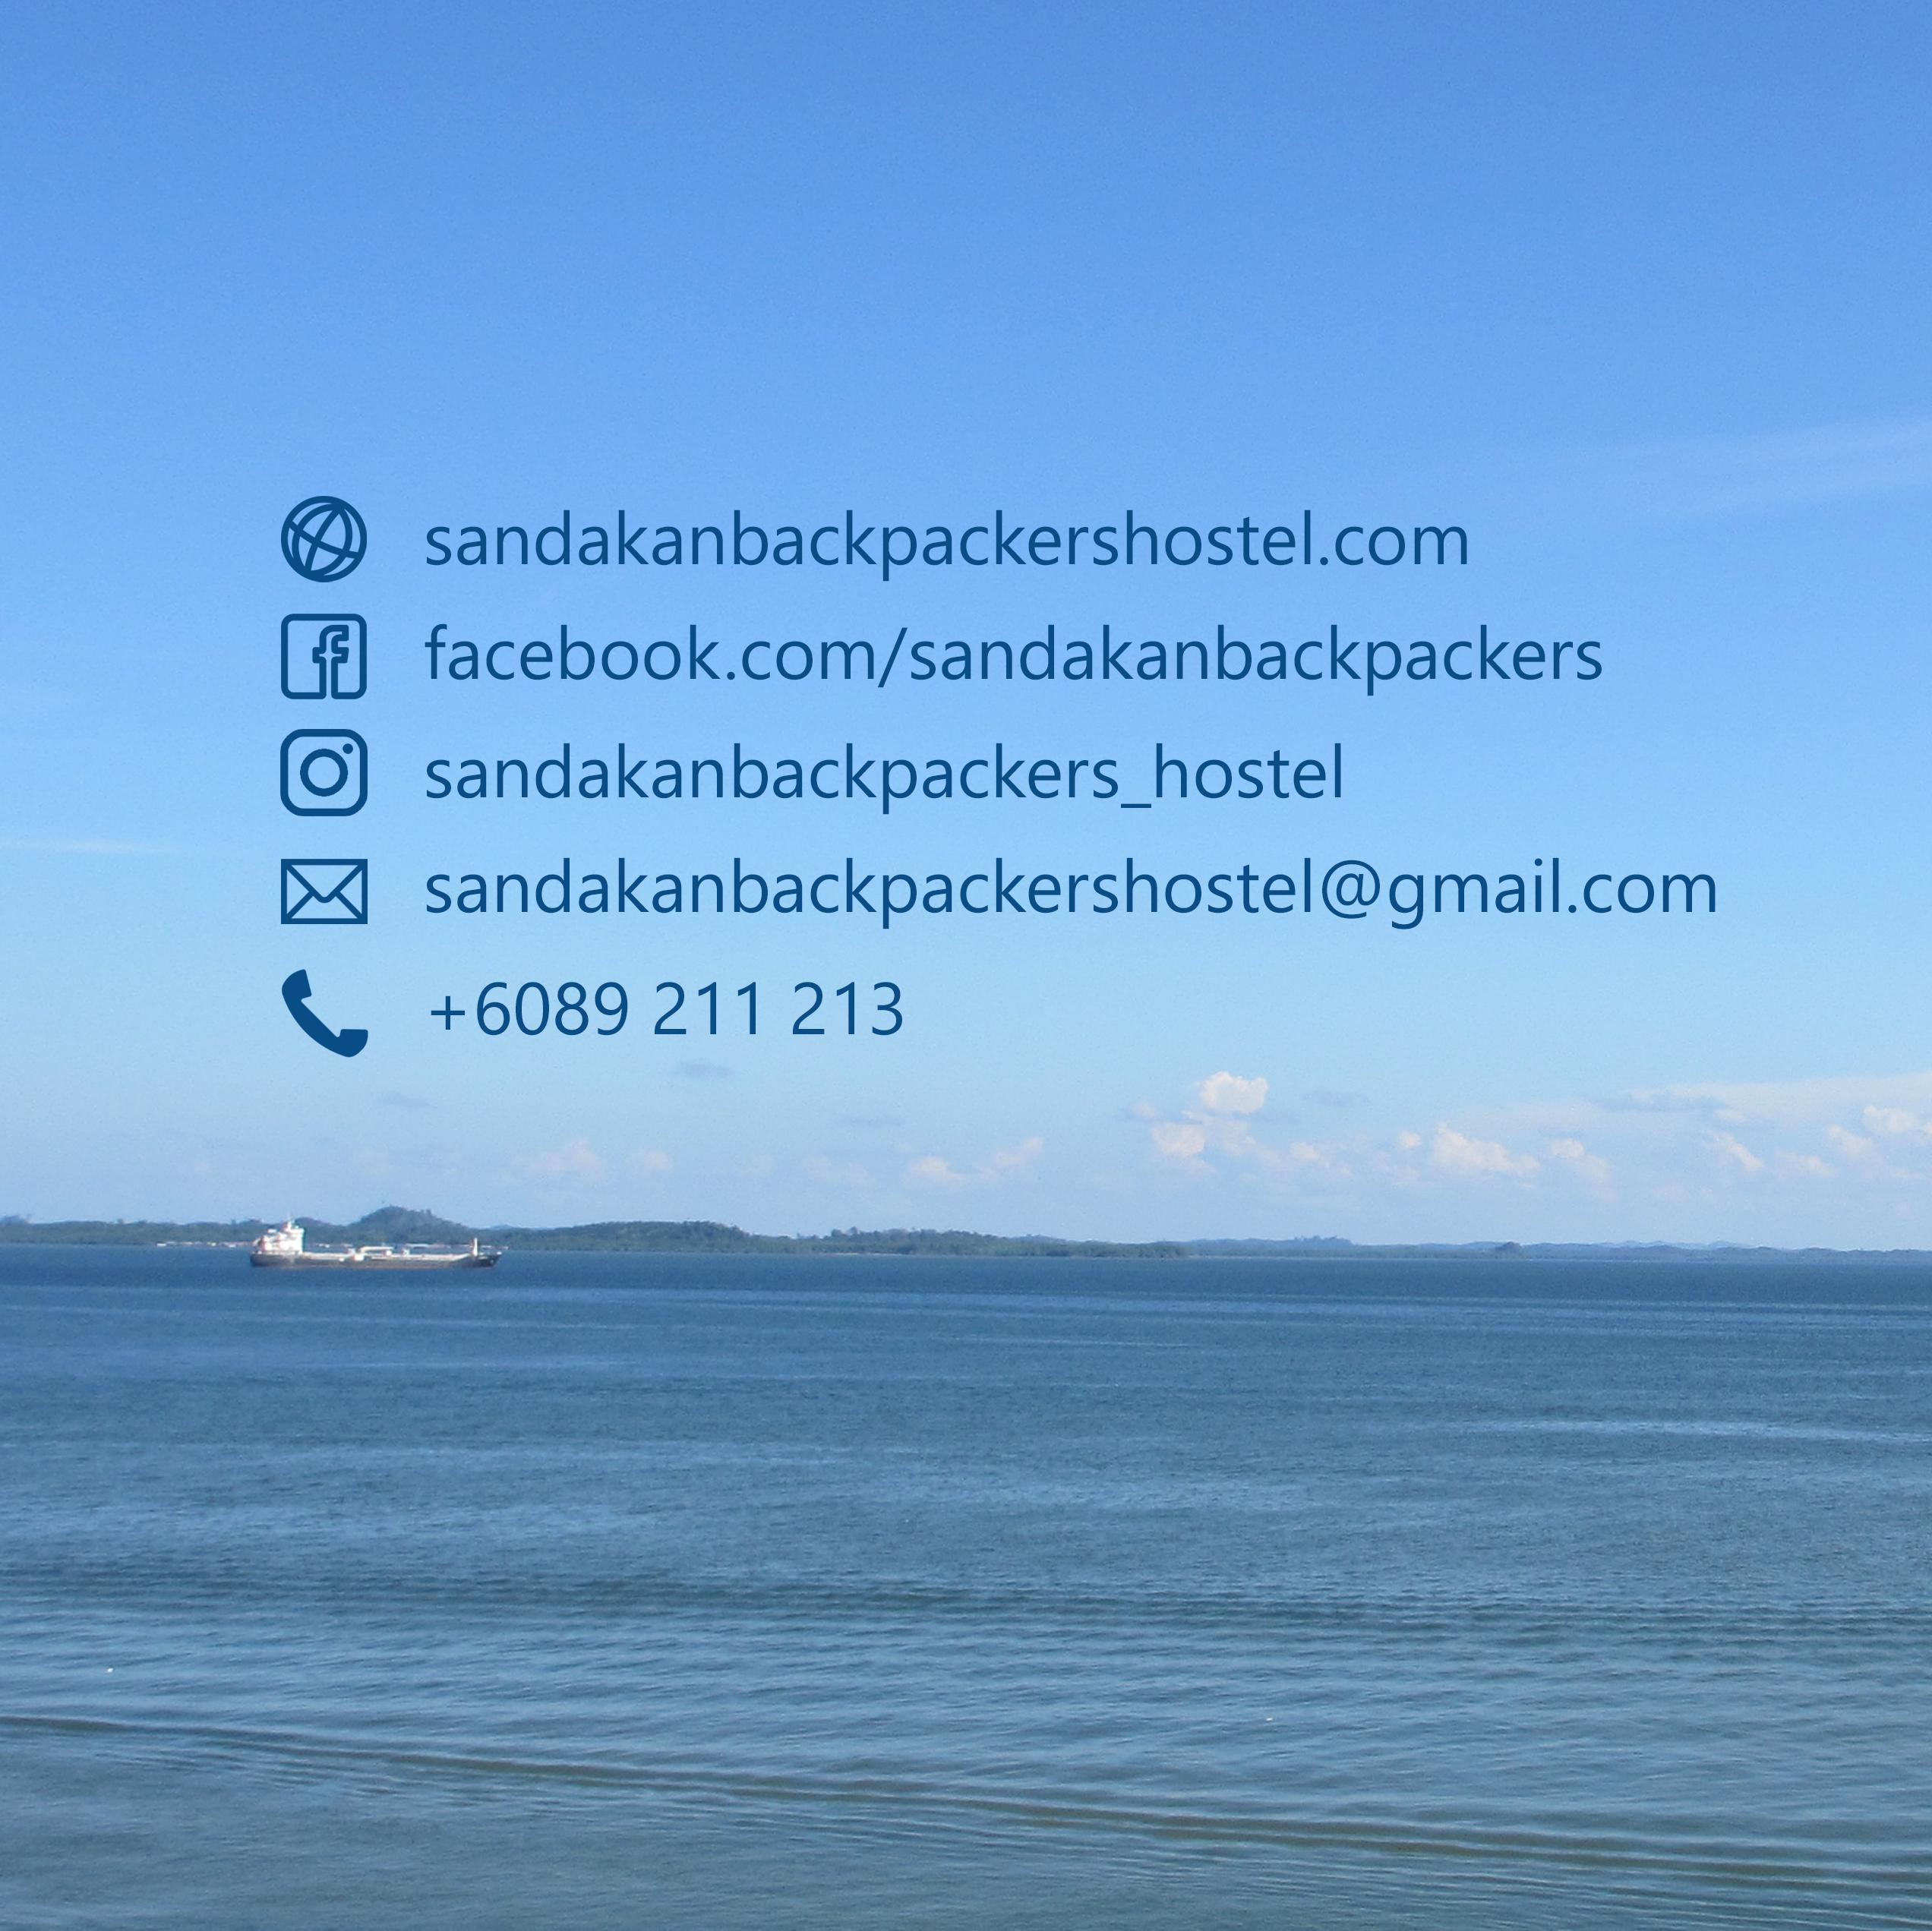 Sandakan Backpackers Hostel